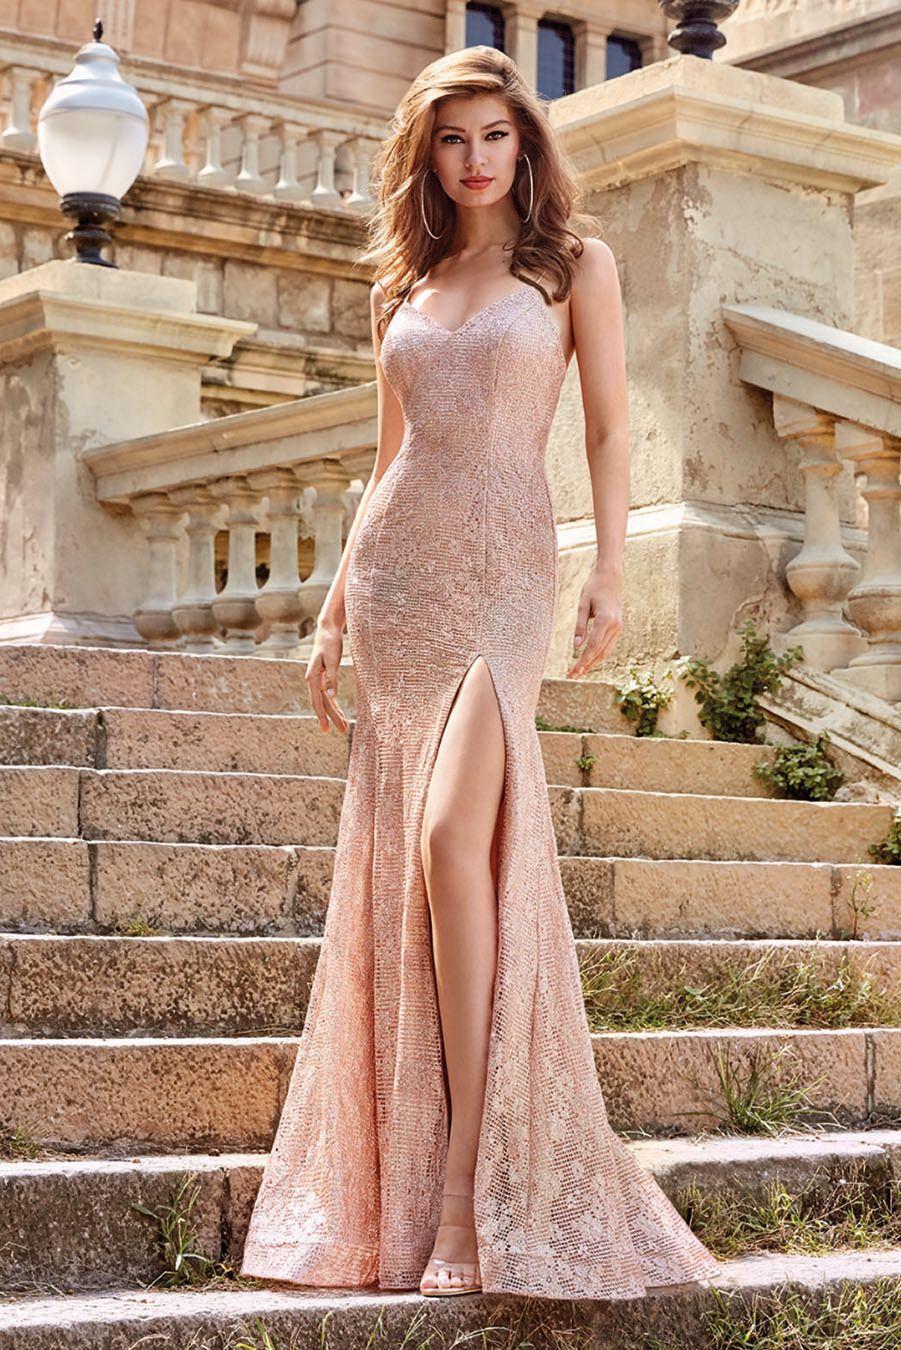 Formal Dress 60817 Long Sweetheart Neckline Straight In 2021 Alyce Paris Dresses Classy Prom Dresses Dresses [ 1350 x 901 Pixel ]